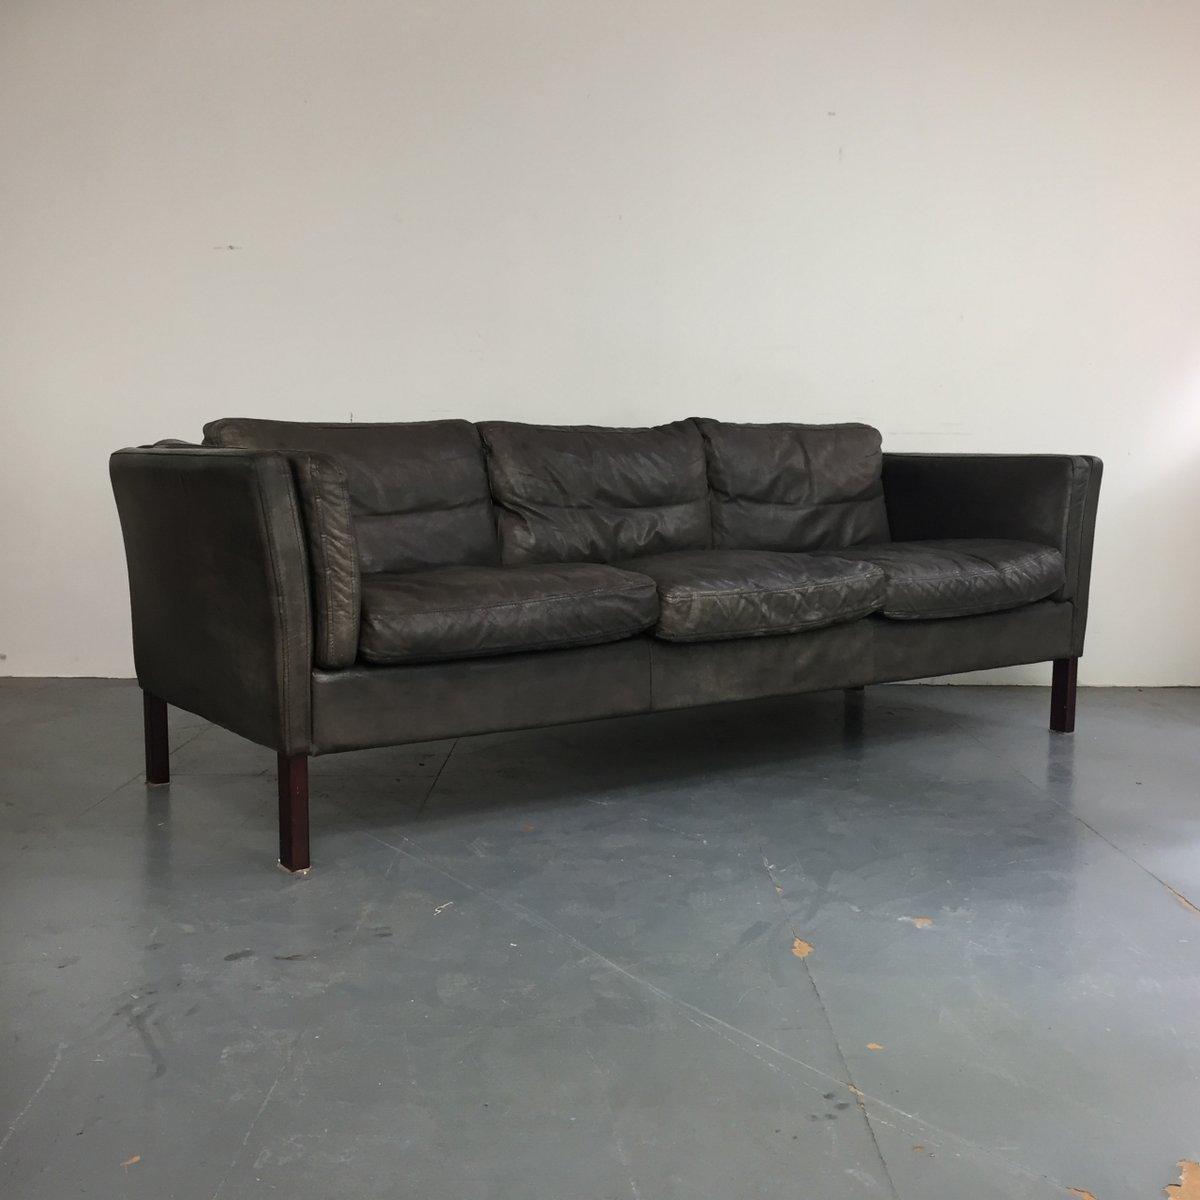 Dunkelgraues 3-Sitzer Sofa aus Leder, 1970er